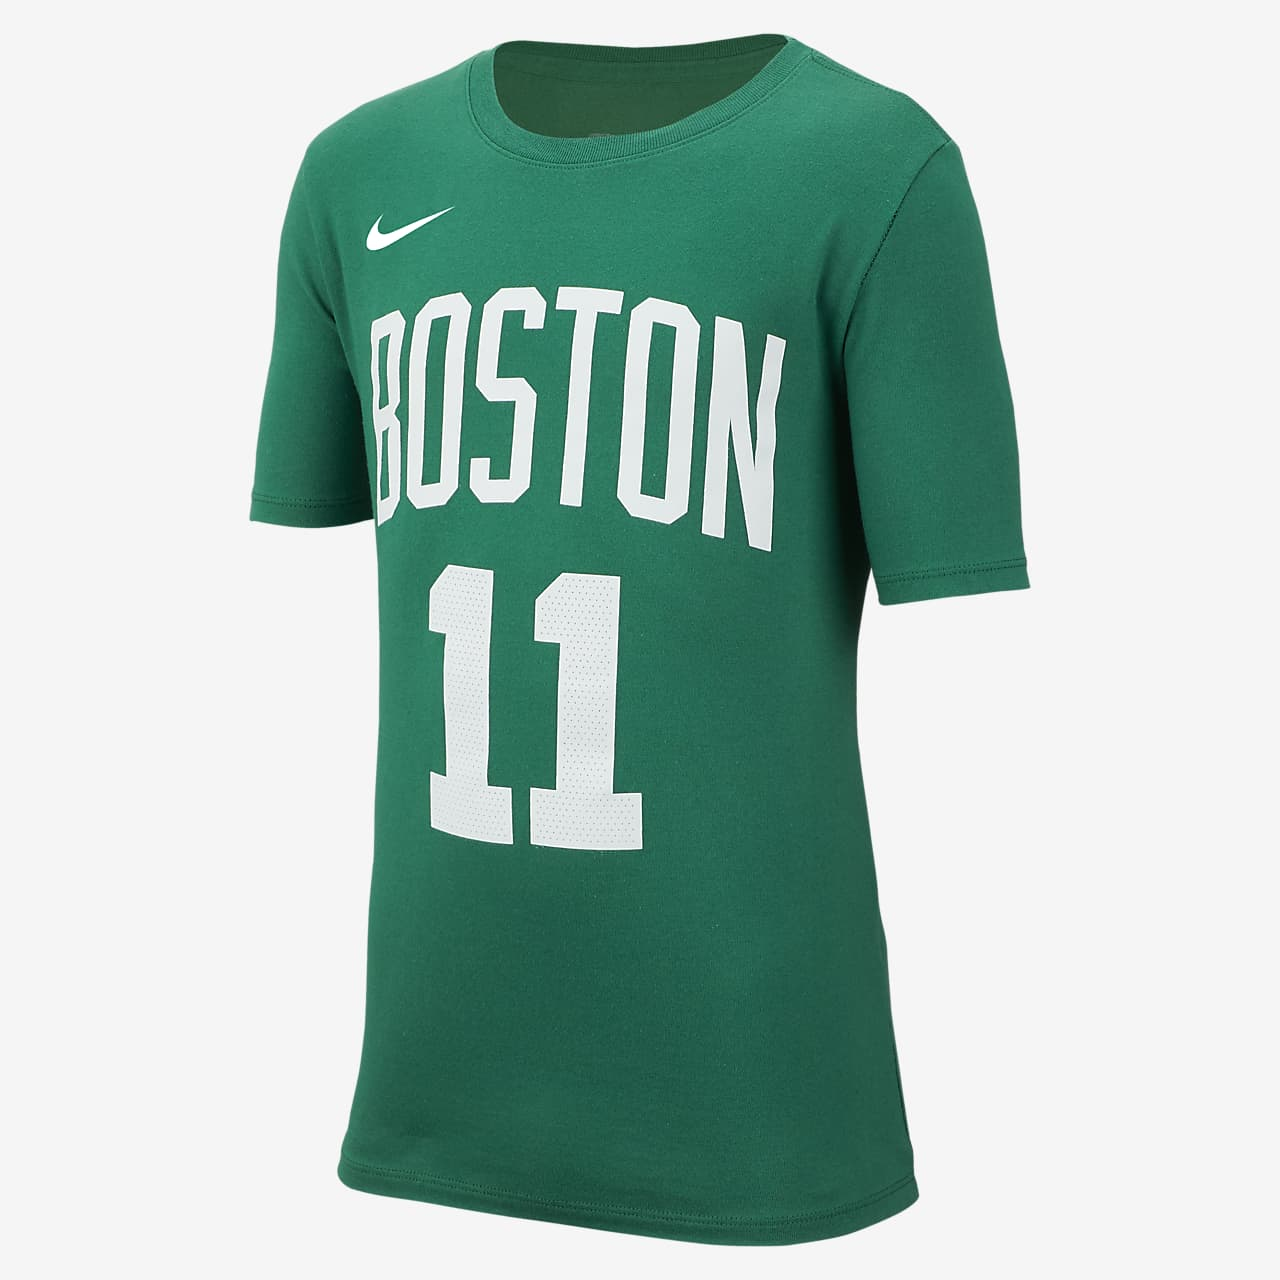 T-shirt de basquetebol Nike Icon NBA Celtics (Irving) Júnior (Rapaz)